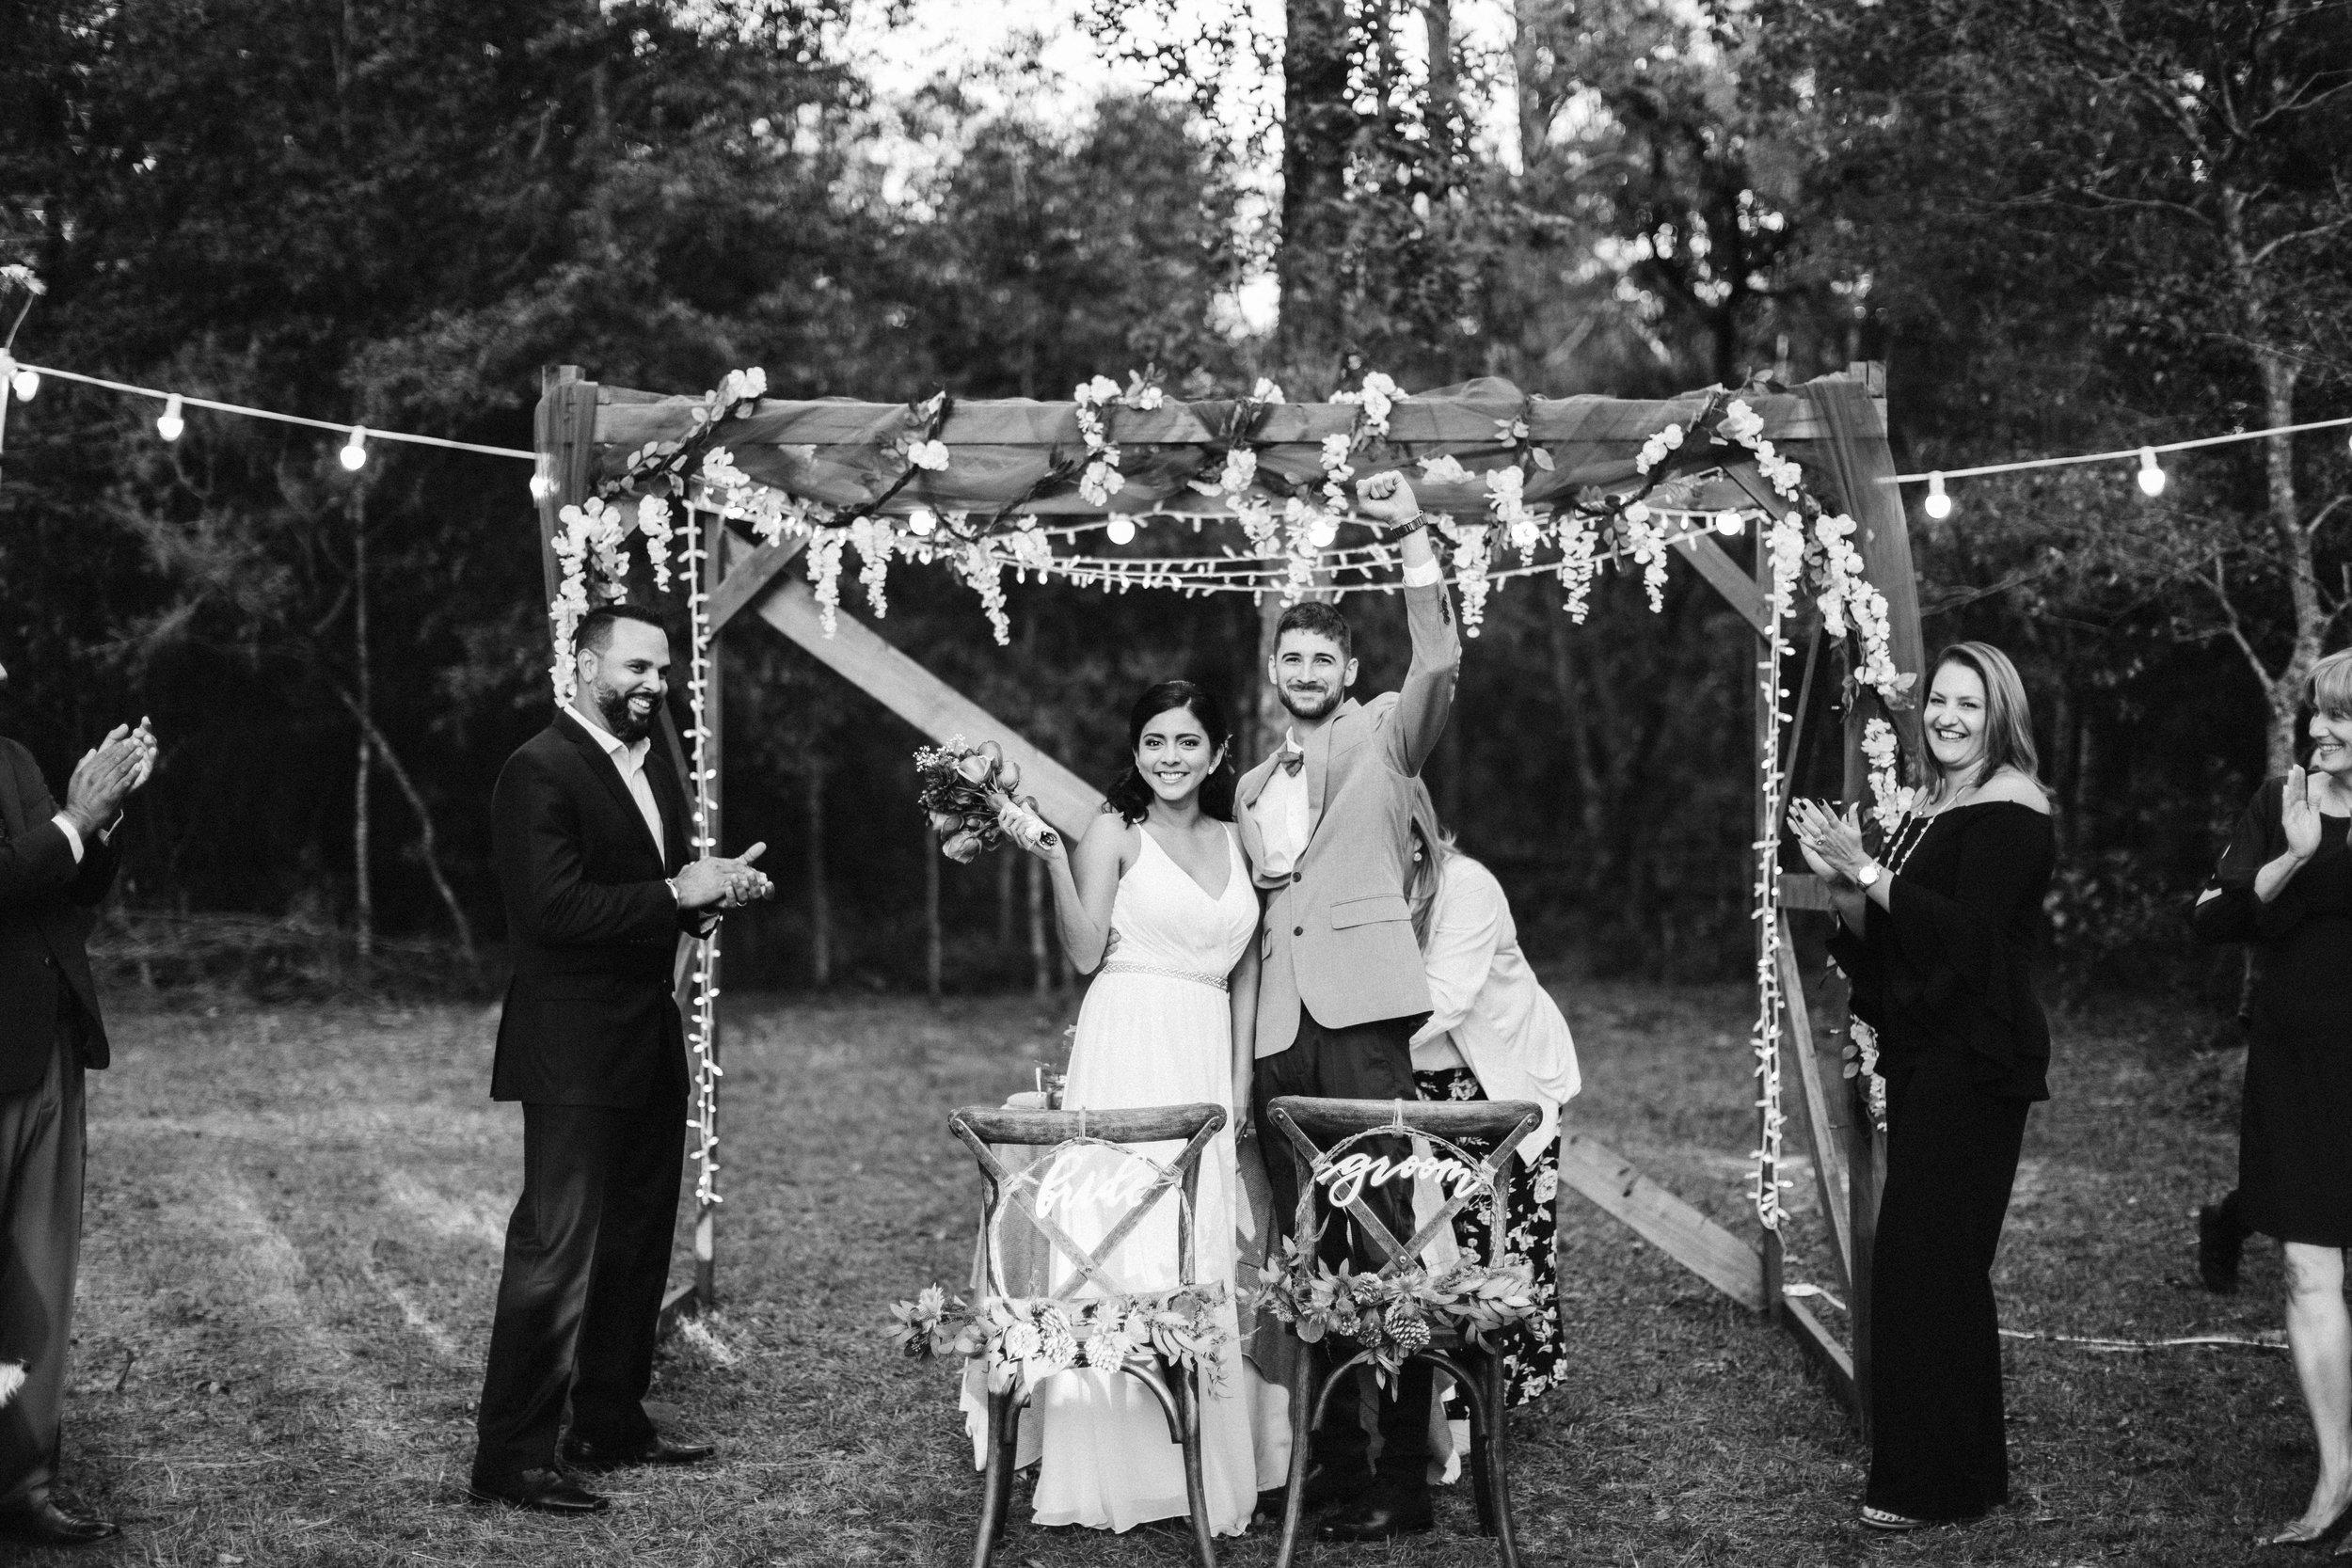 2018.11.03 Jael and Edel Ocala Wedding FINALS (261 of 441).jpg